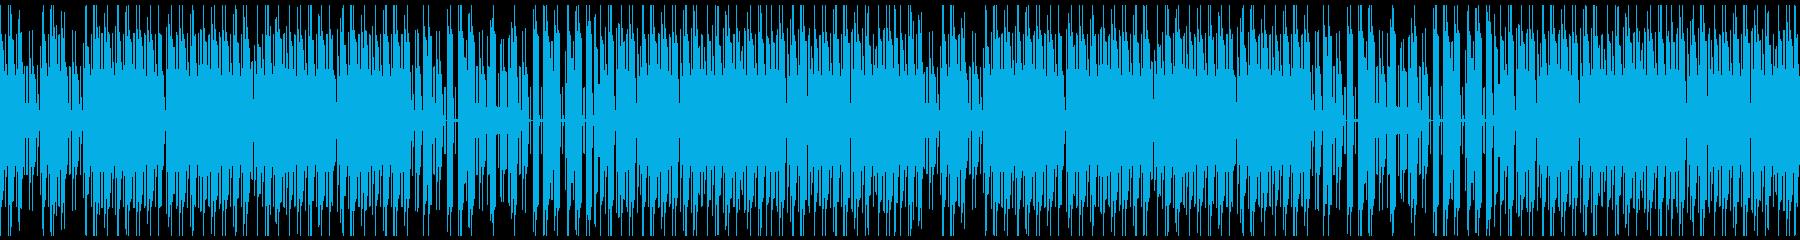 FC風ループ 今日はのんびりとの再生済みの波形